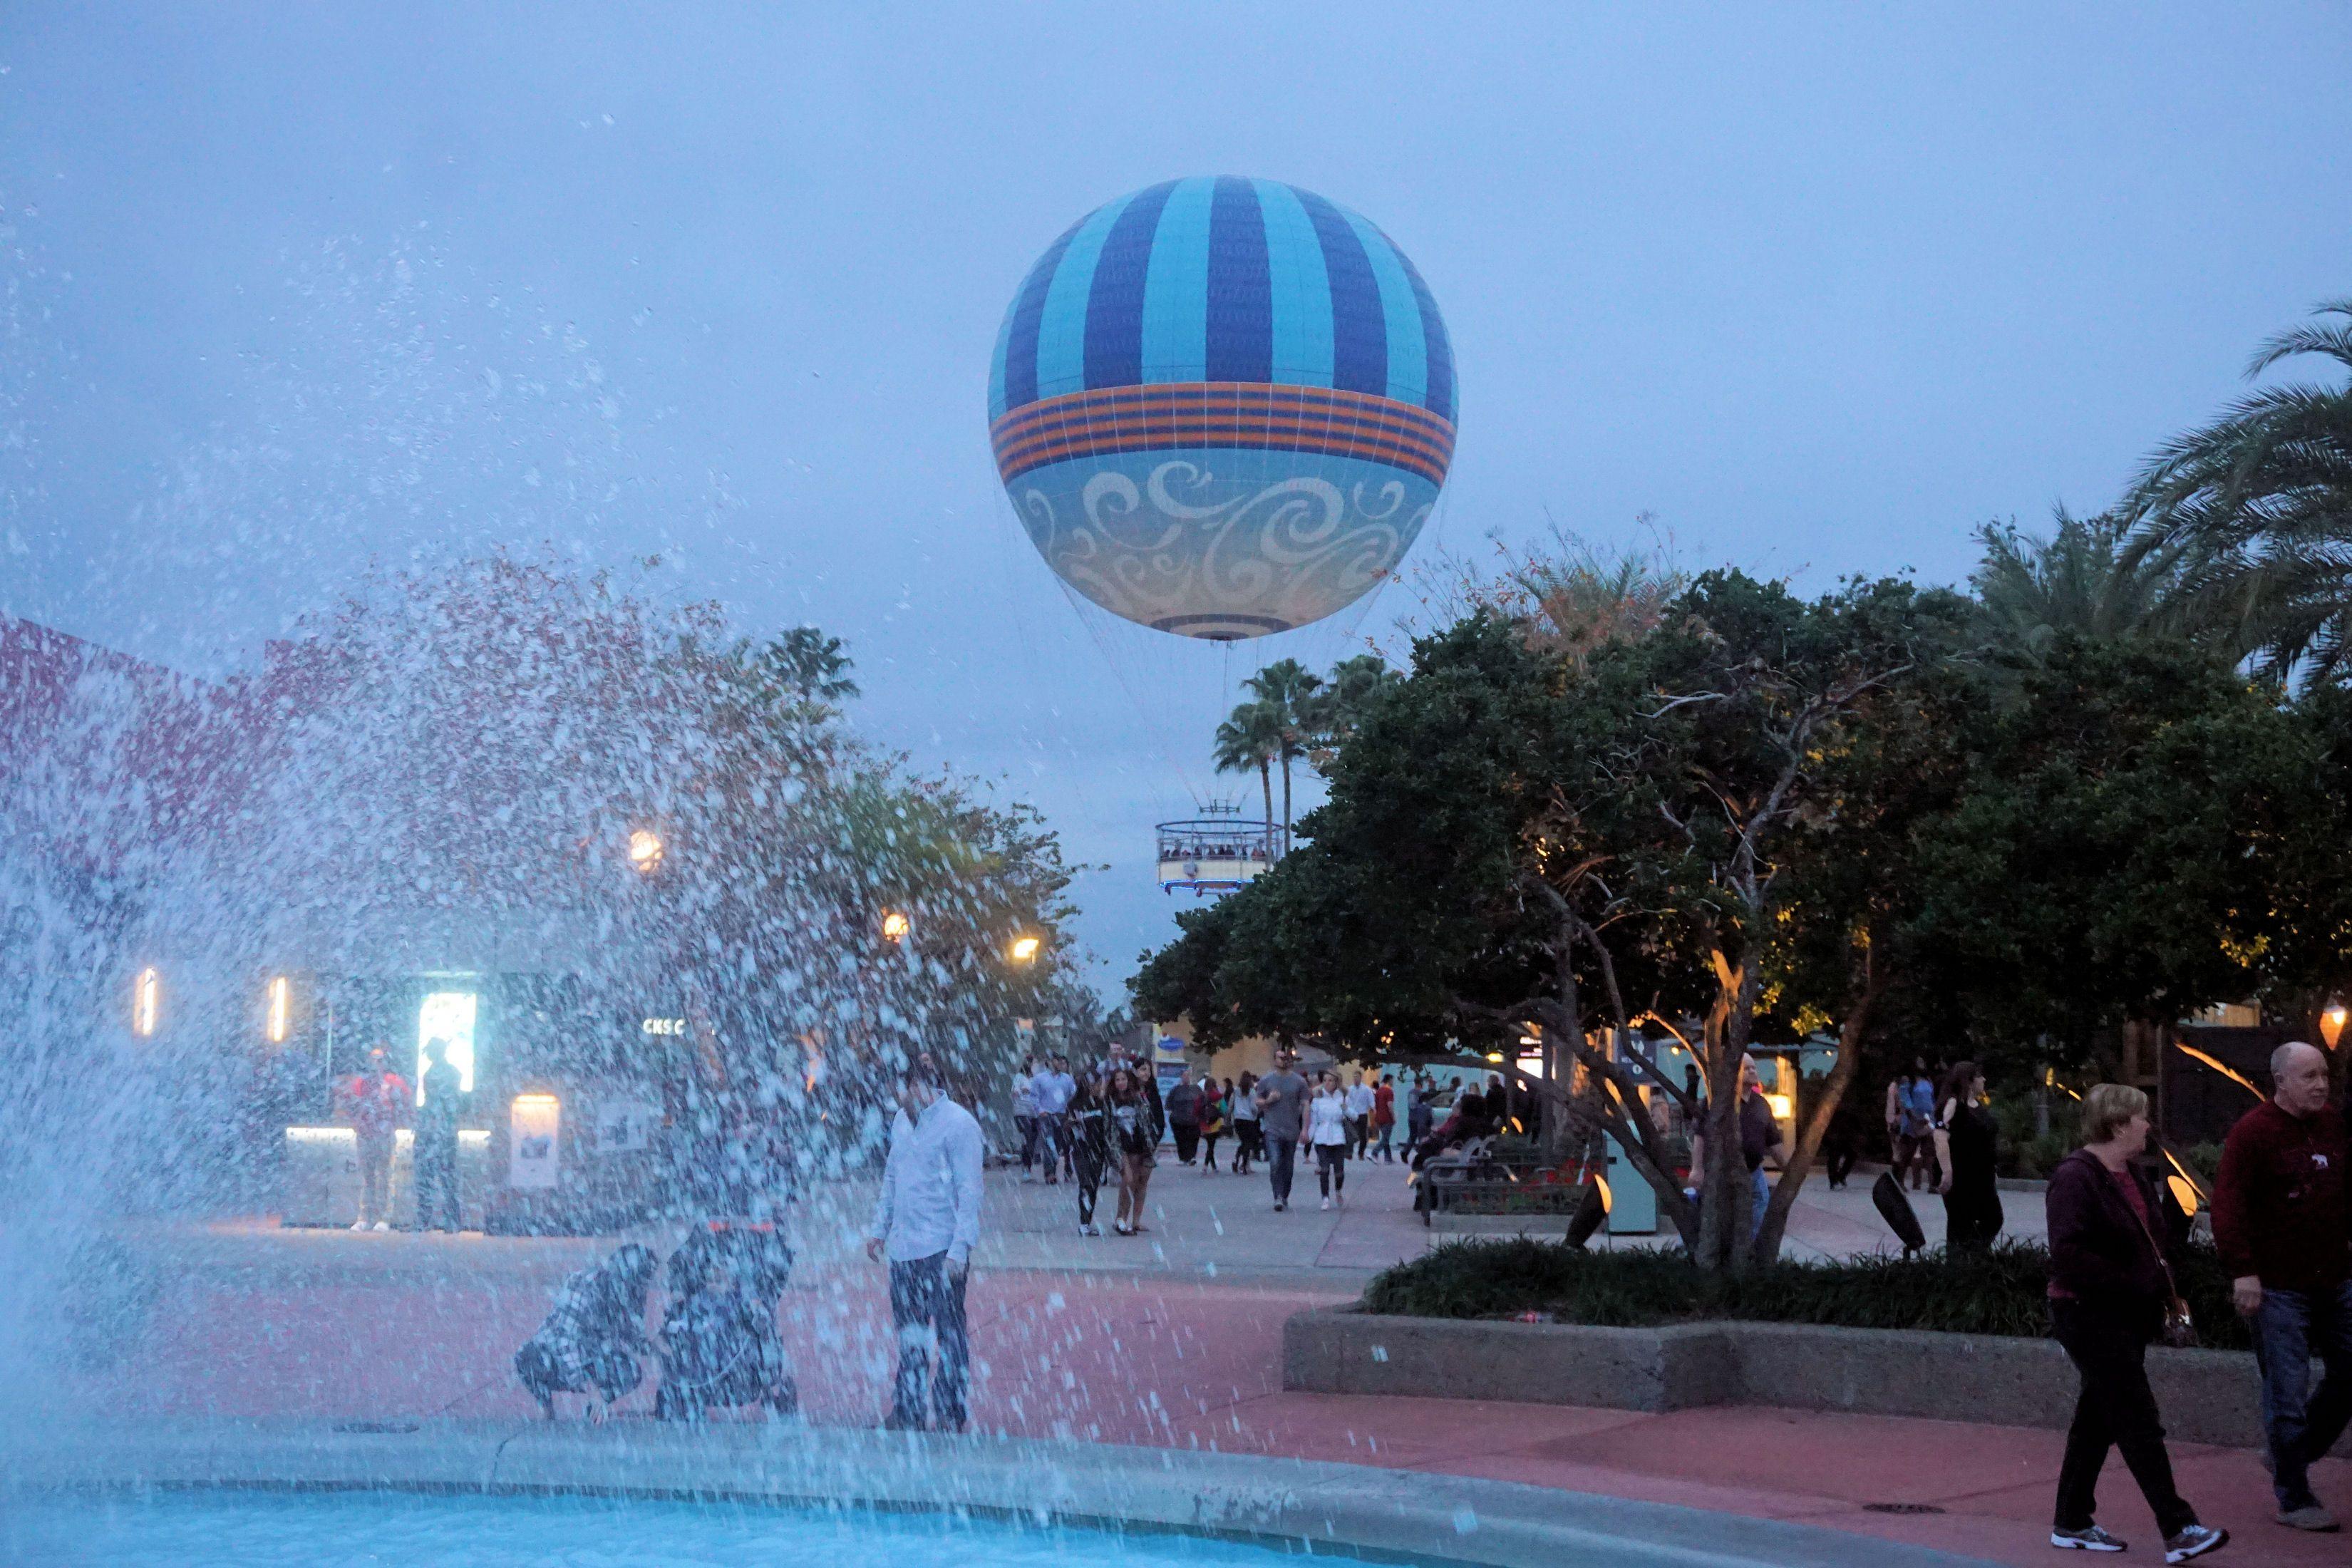 Hot Air Balloon at Disney Springs disneysprings